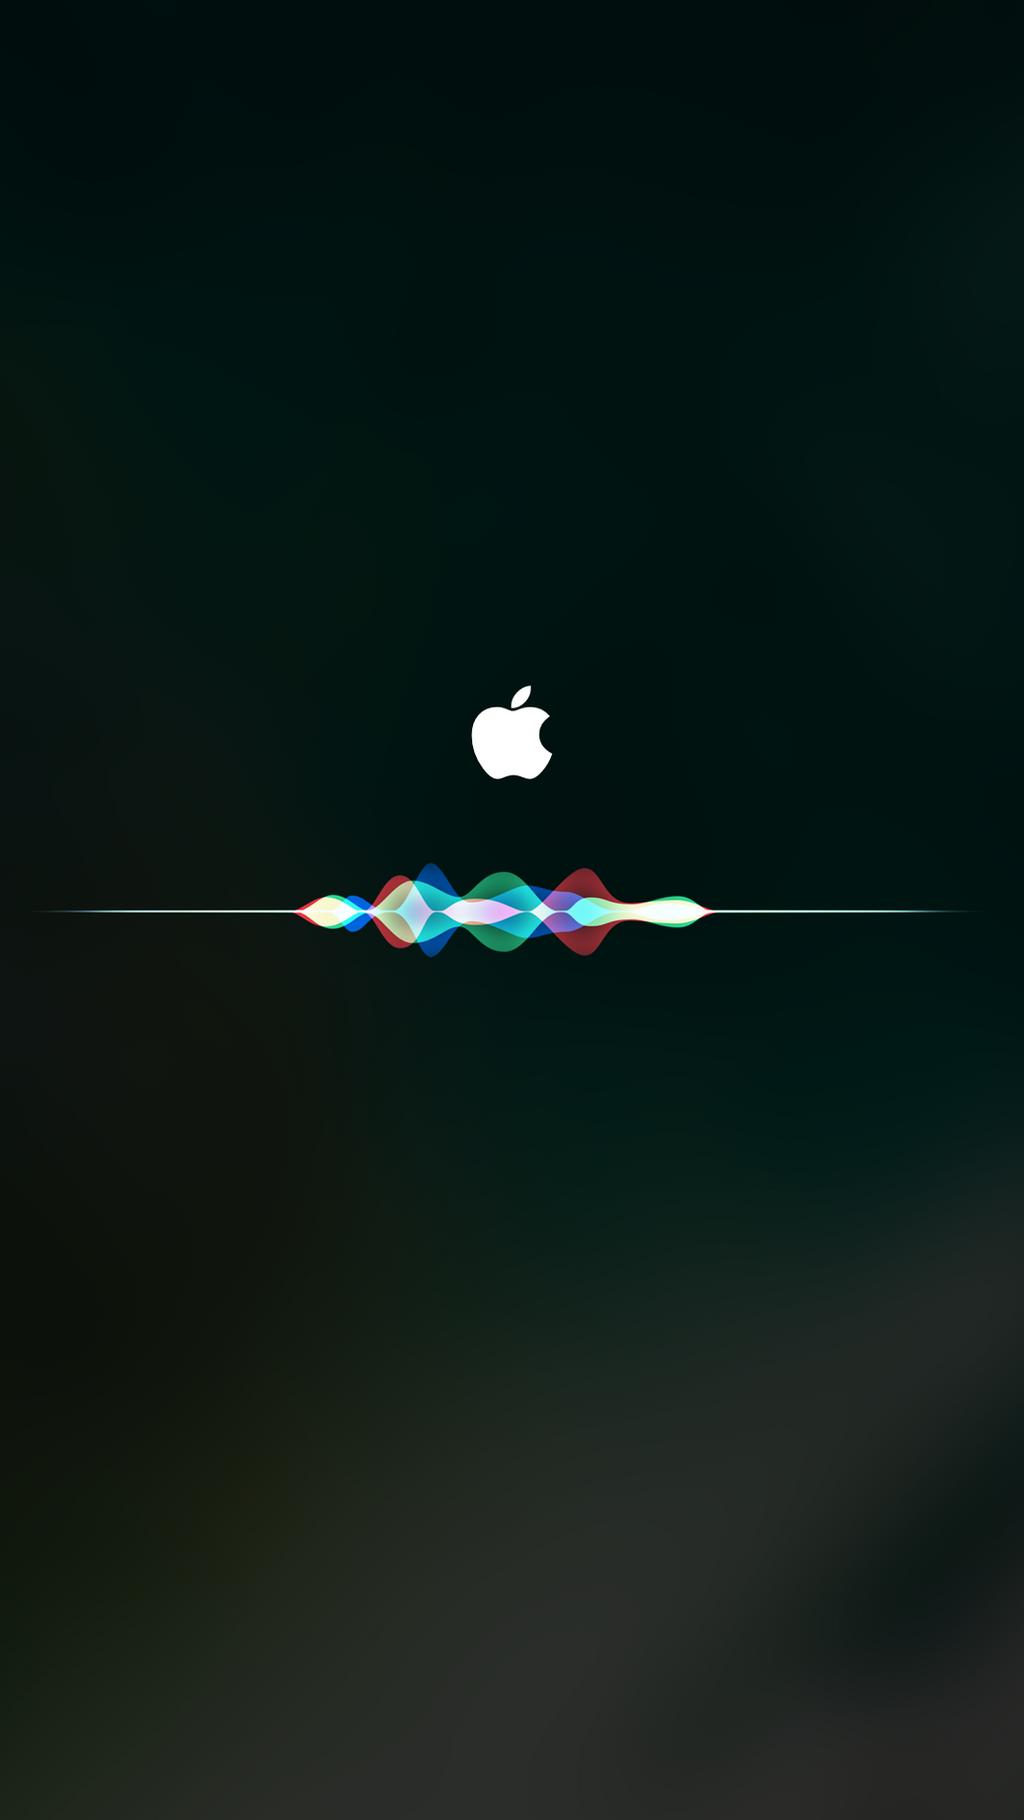 Wallpaper iphone apple logo -  Ios10 With Siri Wallpapers Iphone Applelogo Unzip By Shinjimac